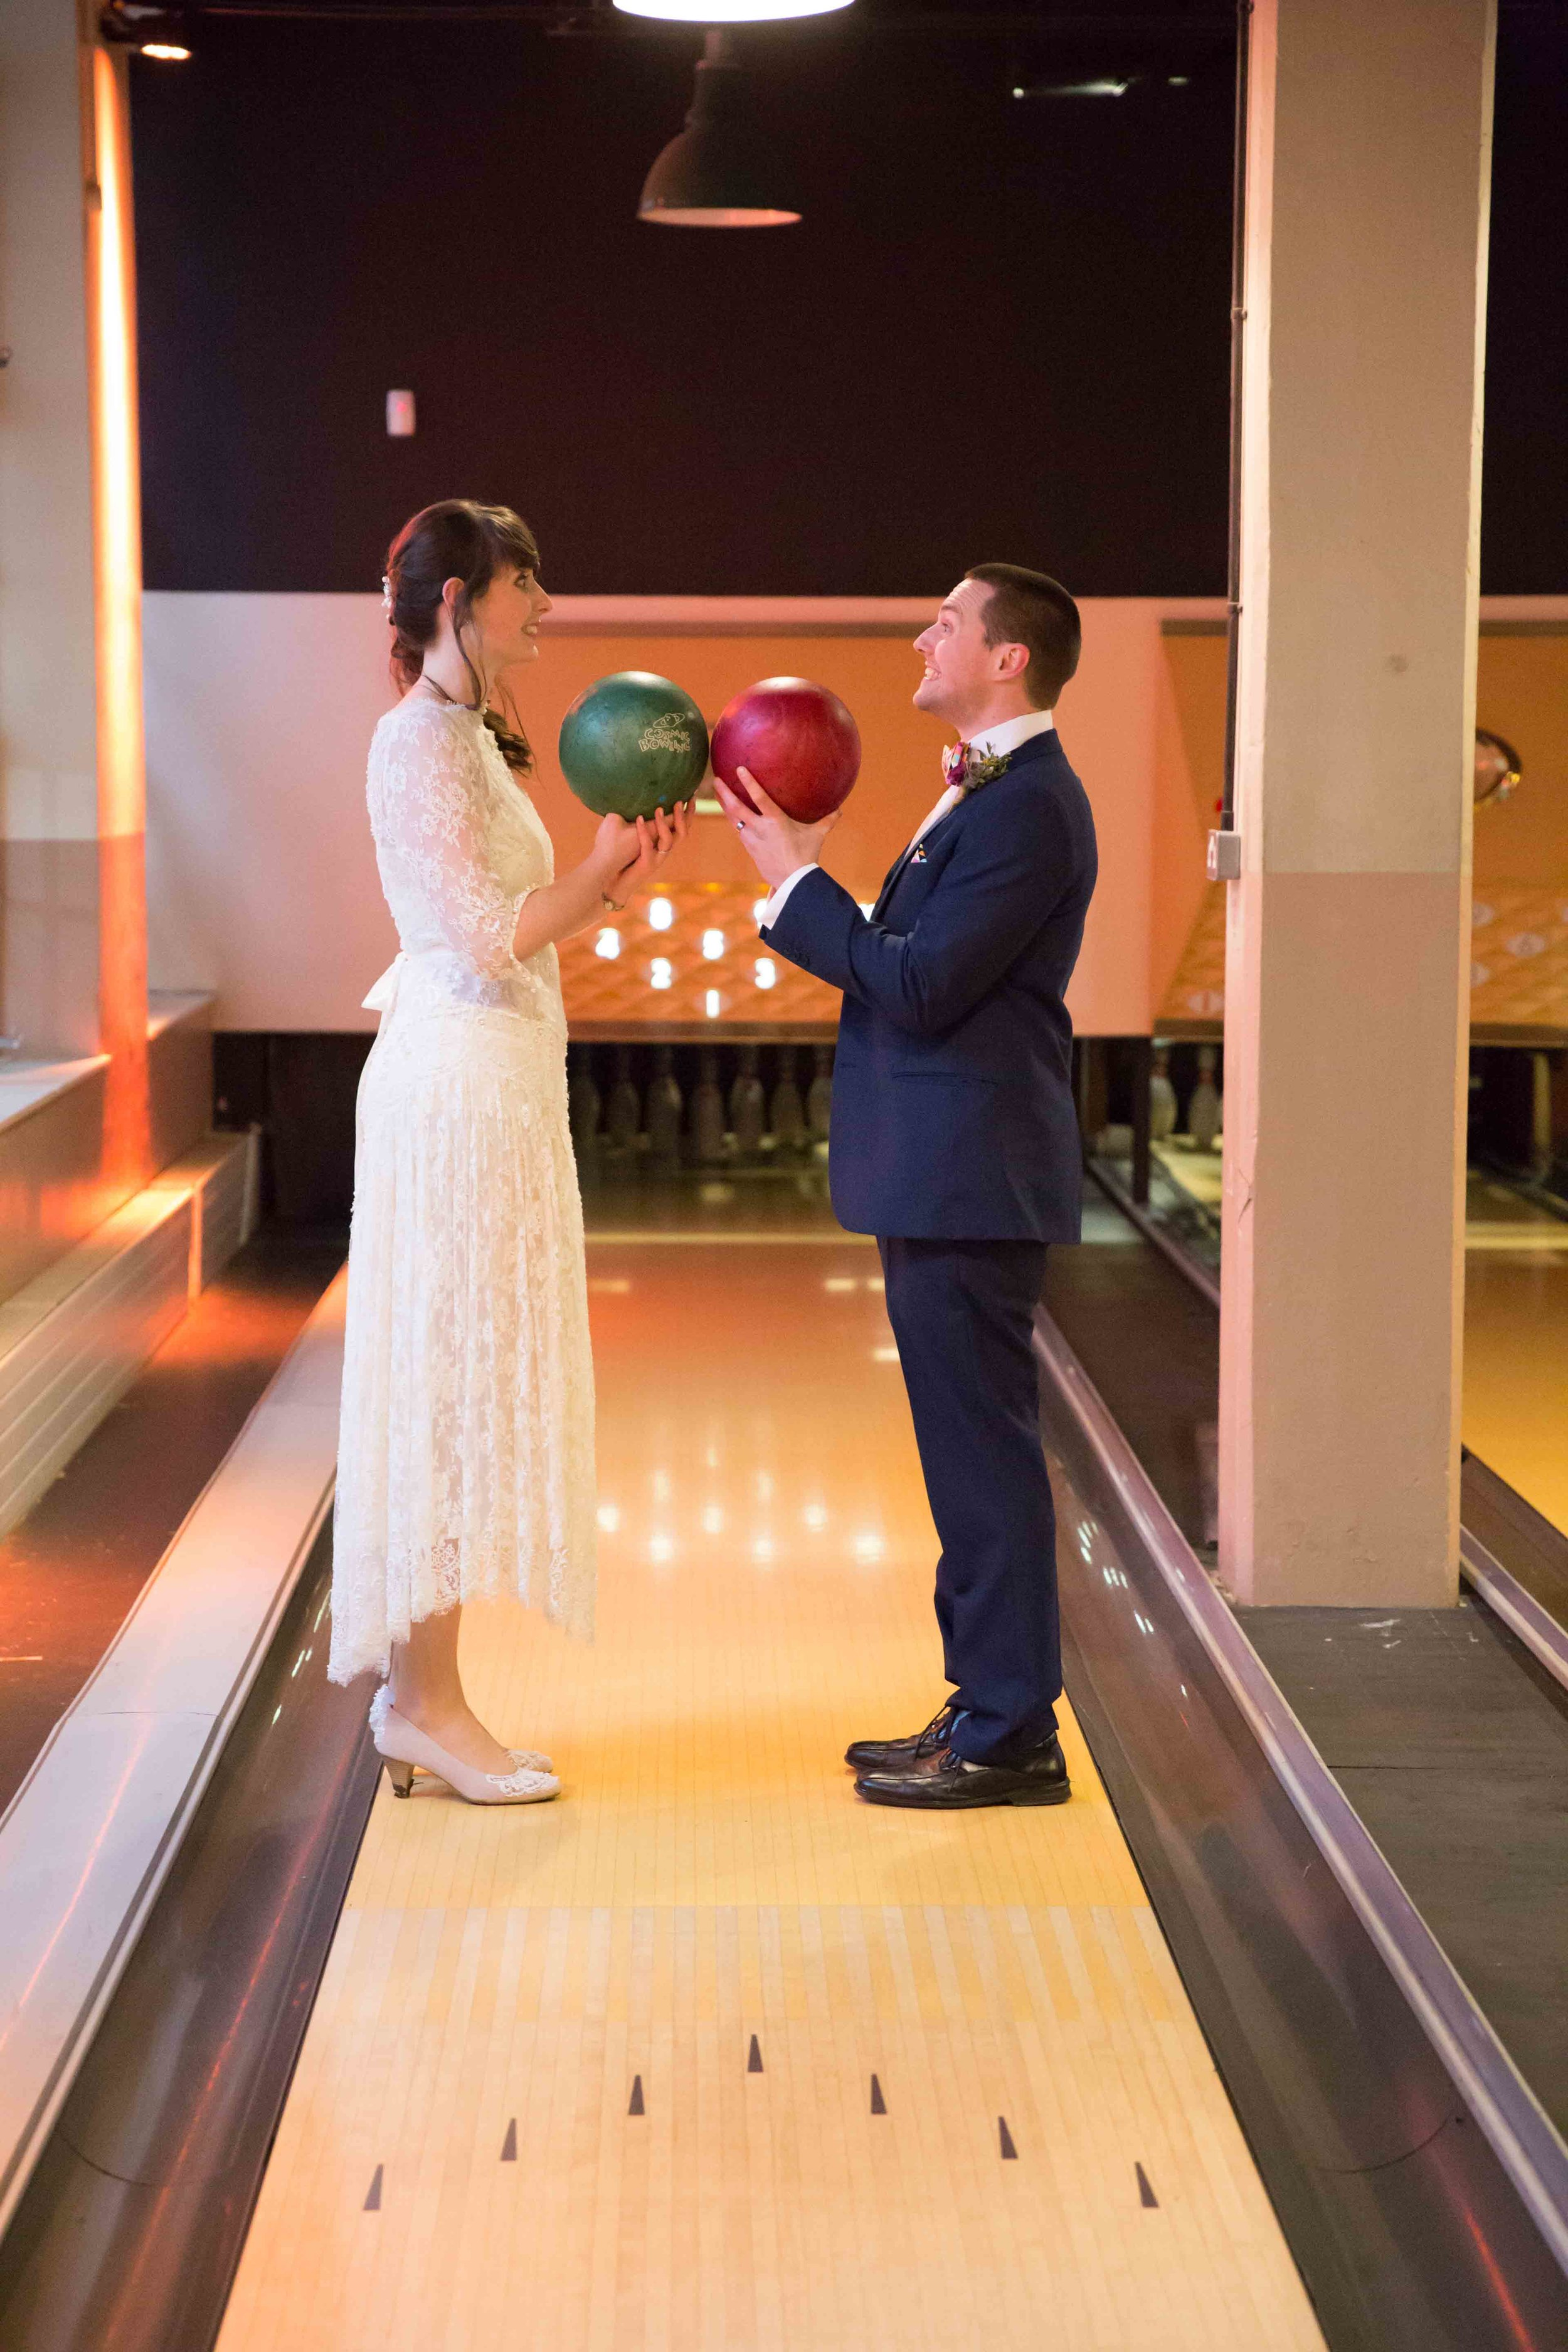 Adam & Faye - Wright Wedding Photography - Bristol Wedding Photographer -314.jpg